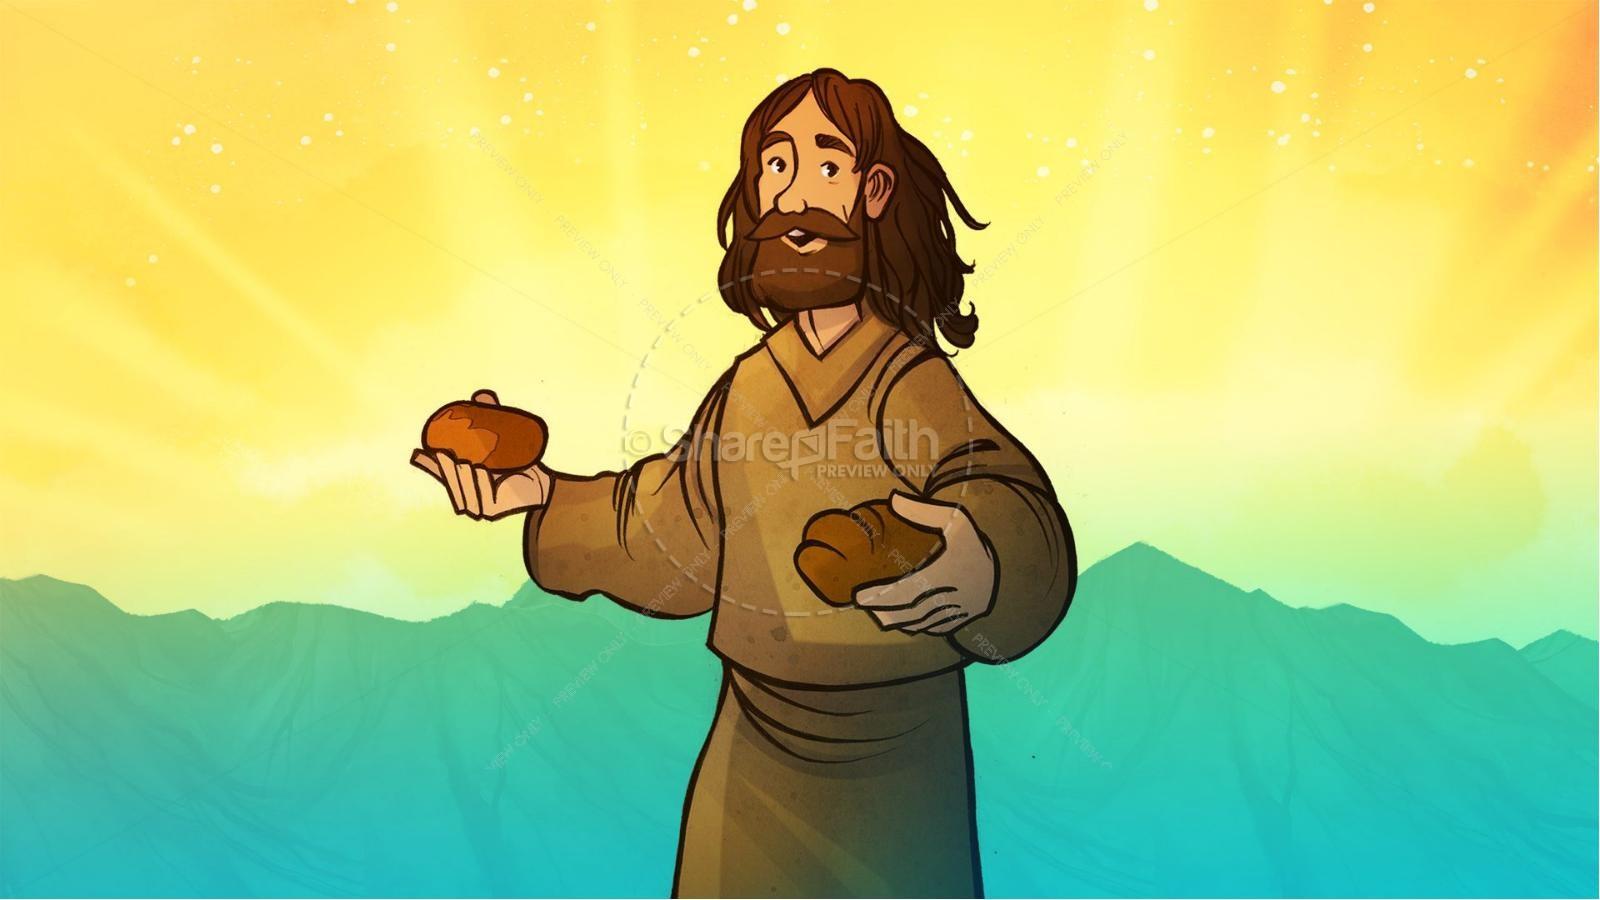 John 6 Bread of Life Kids Bible Stories | slide 8